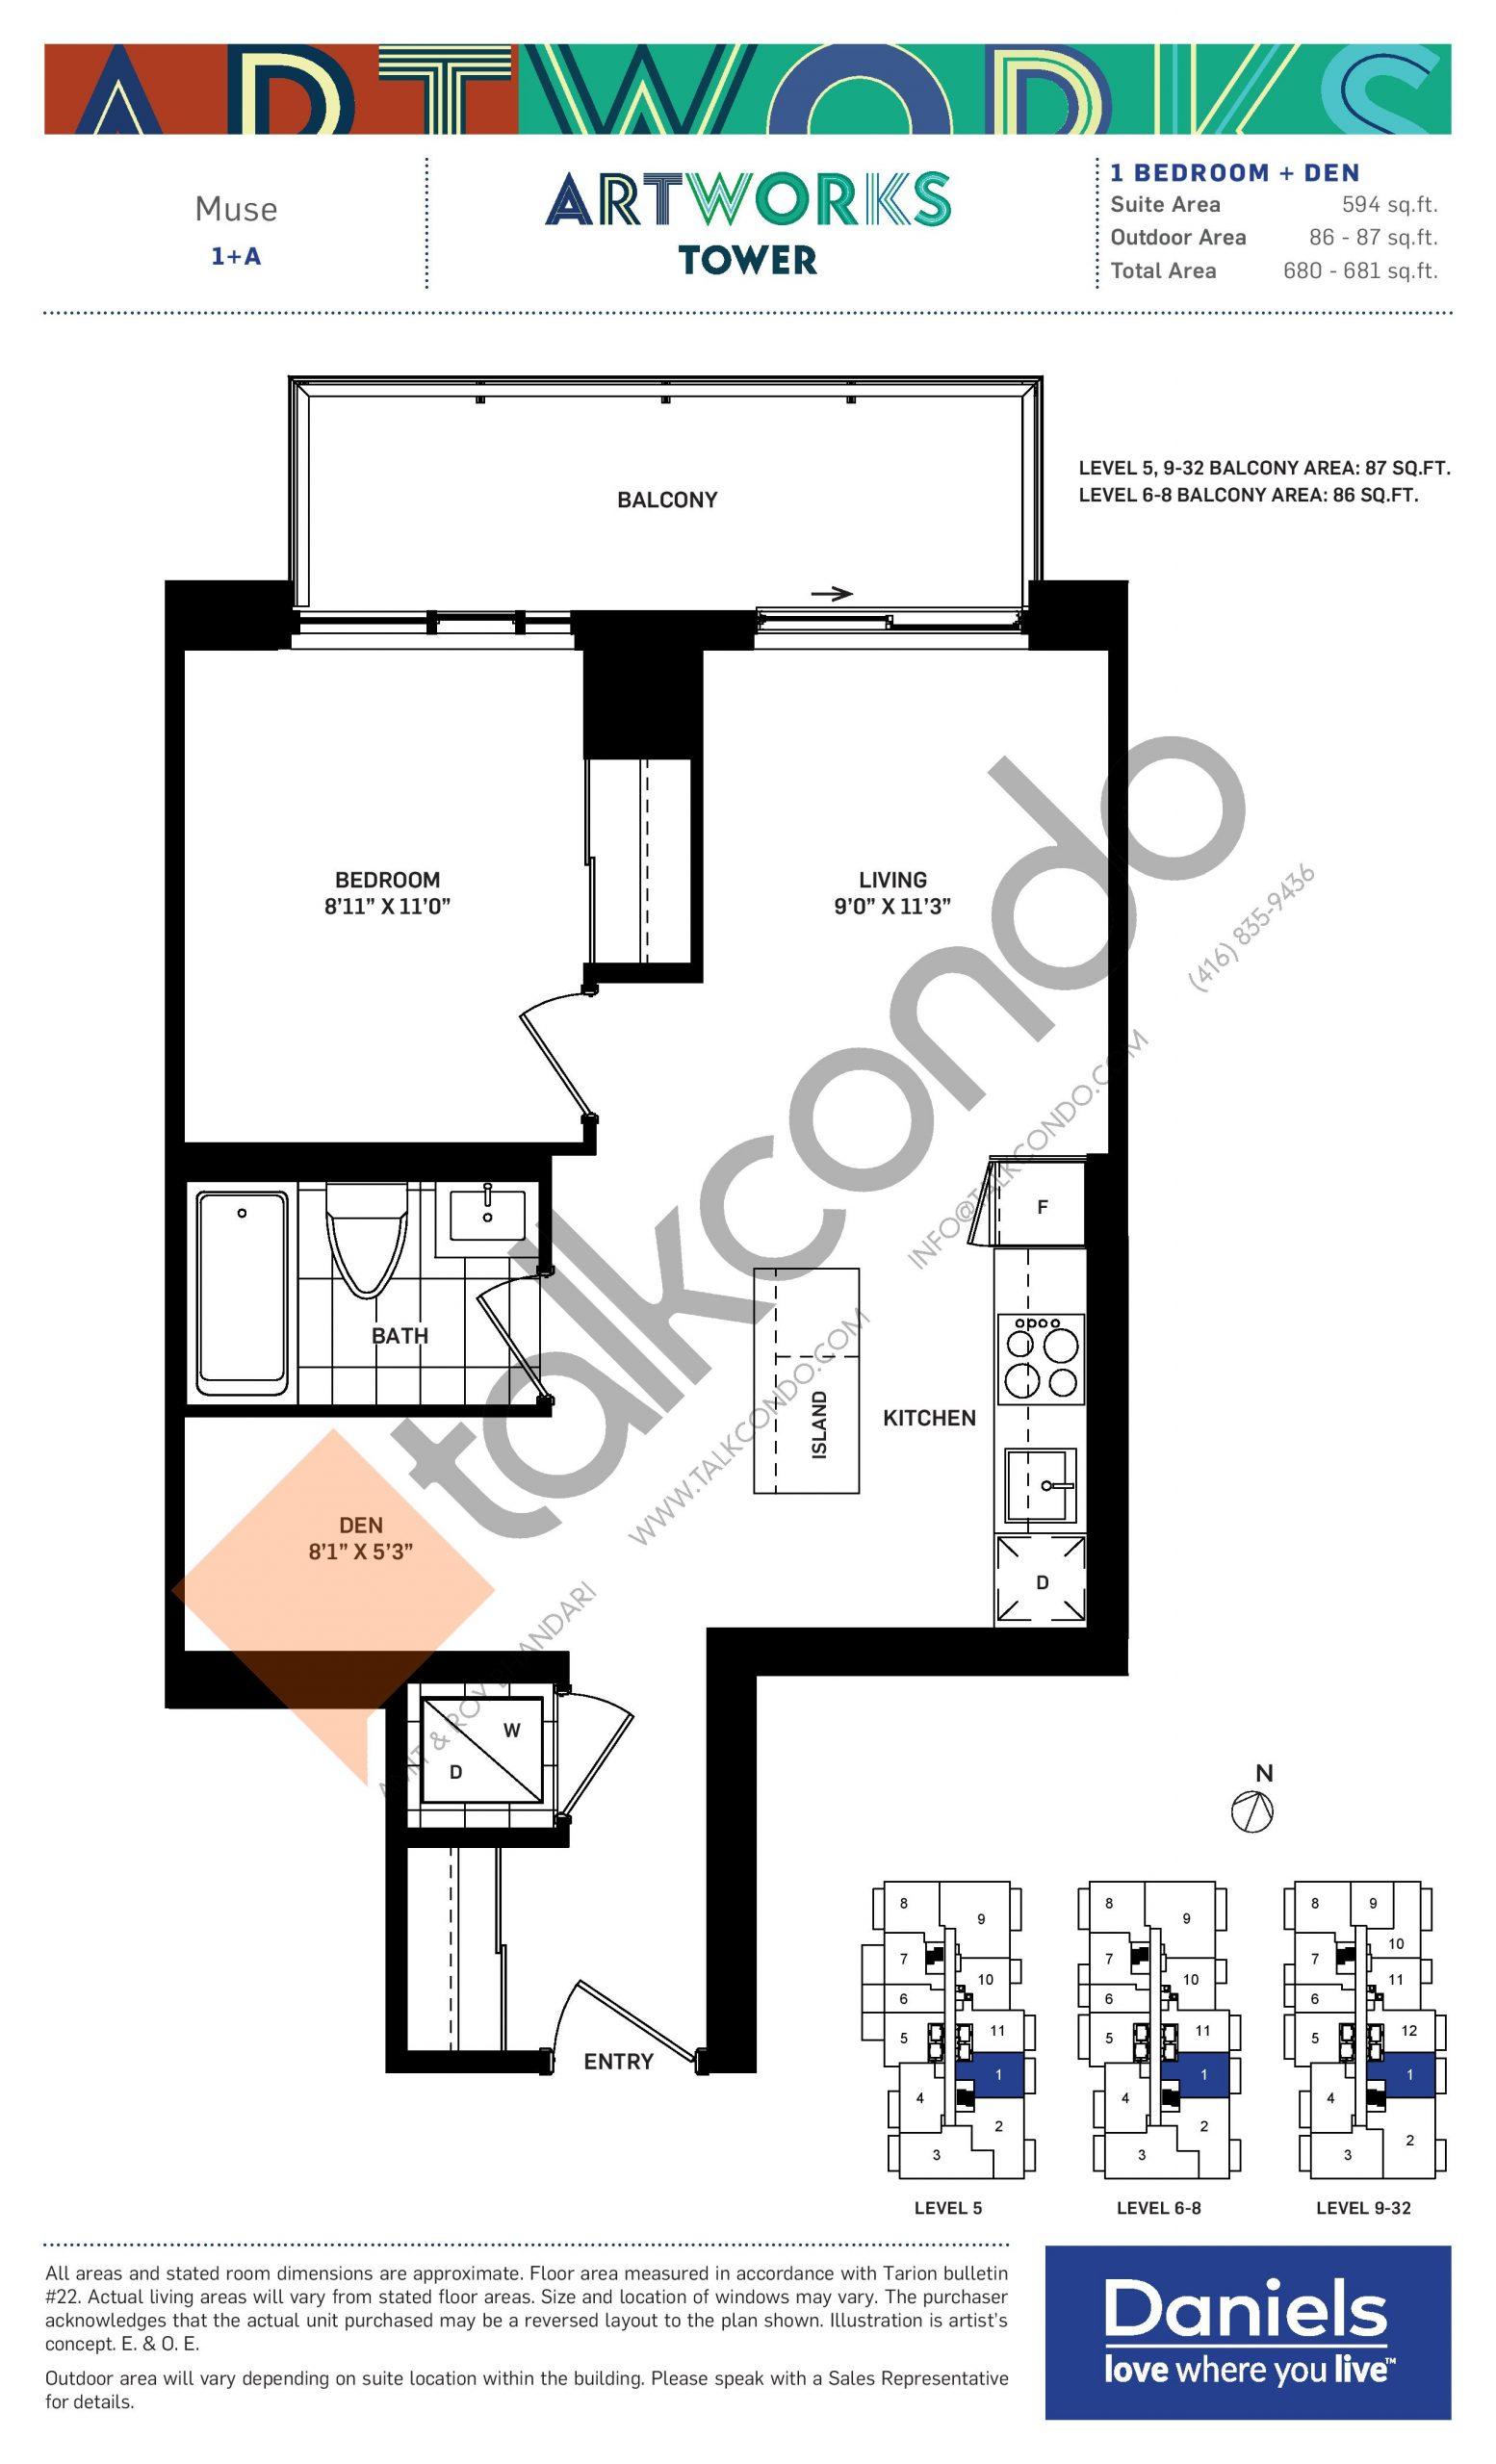 Muse Floor Plan at Artworks Tower Condos - 594 sq.ft